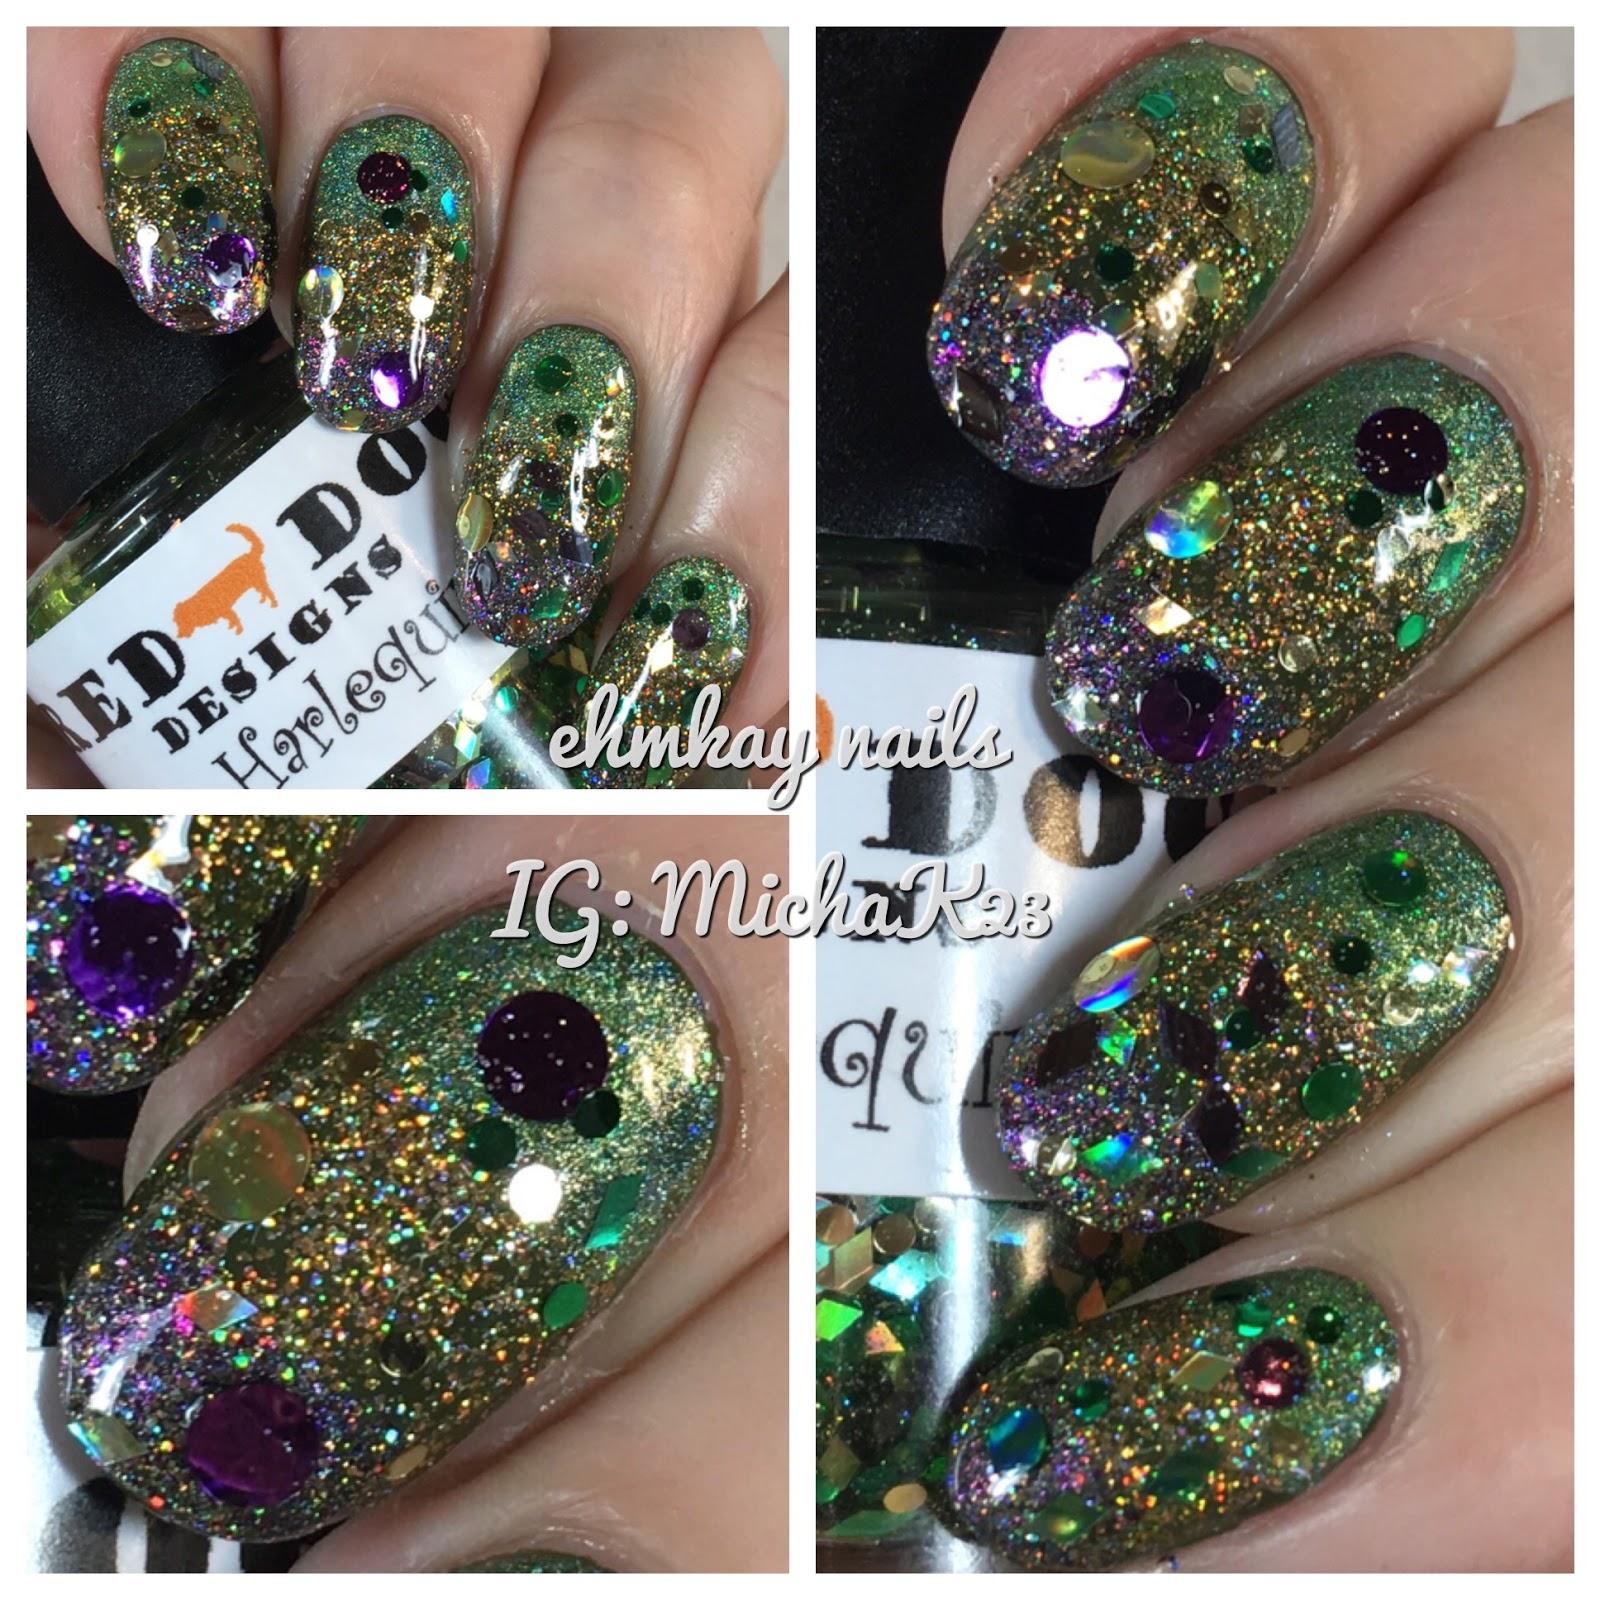 ehmkay nails: Mardi Gras Nail Art: Glitter Stripes with Indie Polish